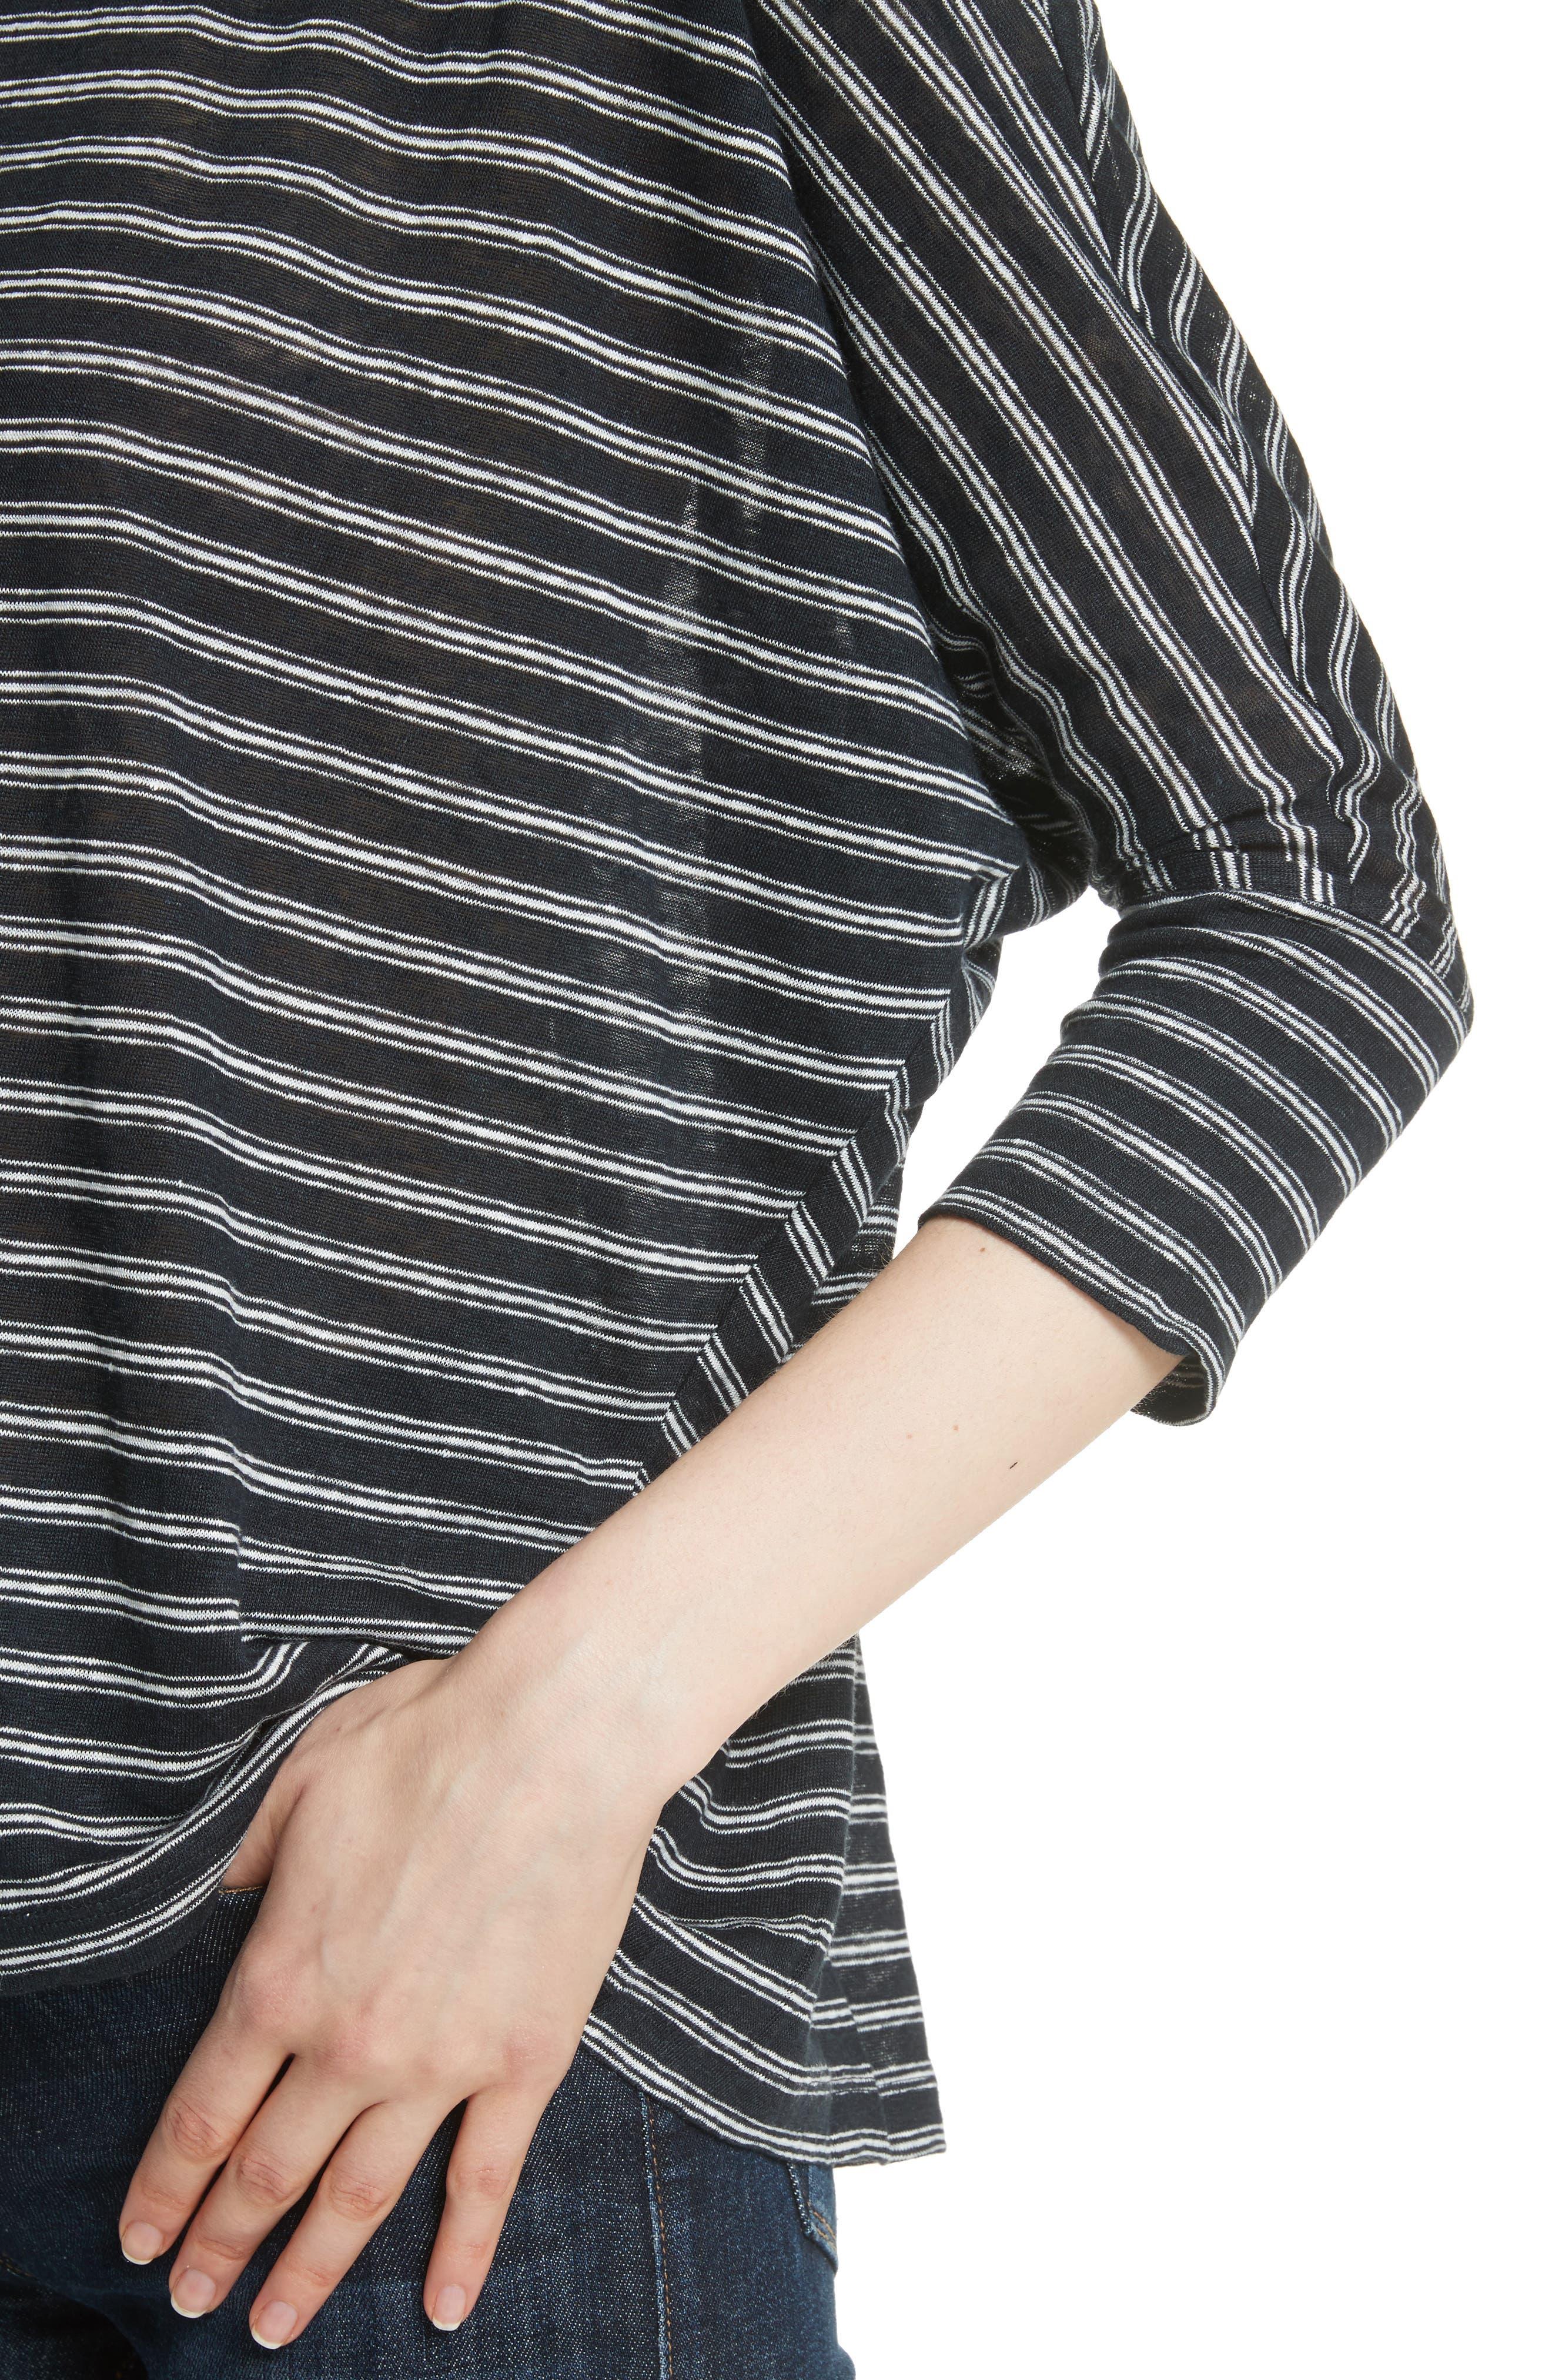 Stripe Linen Knit Top,                             Alternate thumbnail 4, color,                             904